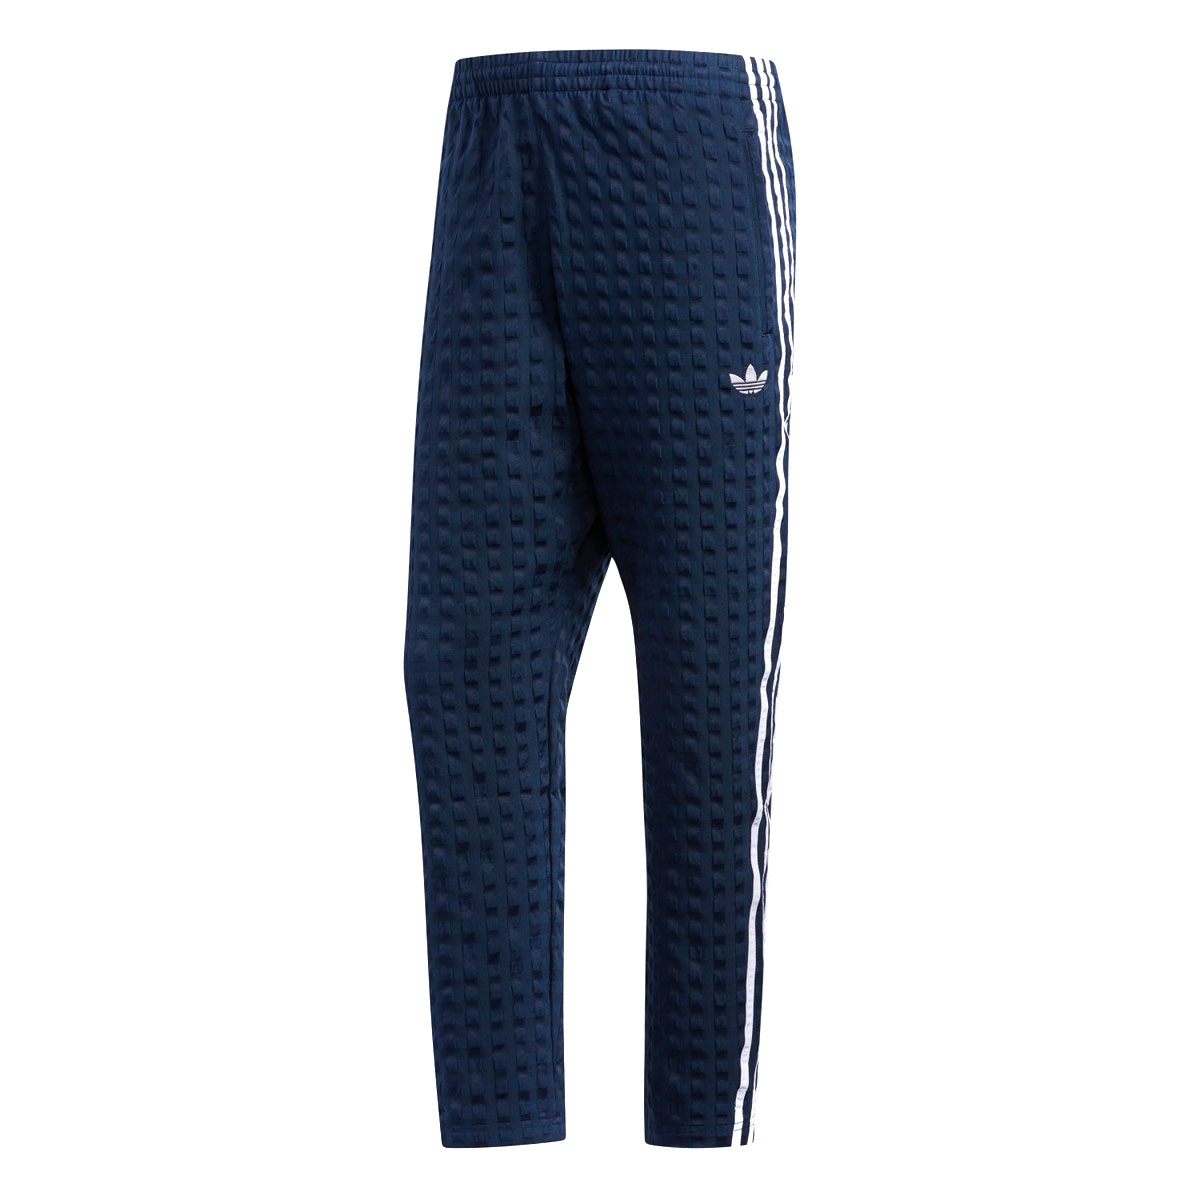 Navy Originals college adidas Chckr Adidas Pants Underwear dAnqwxZZIT